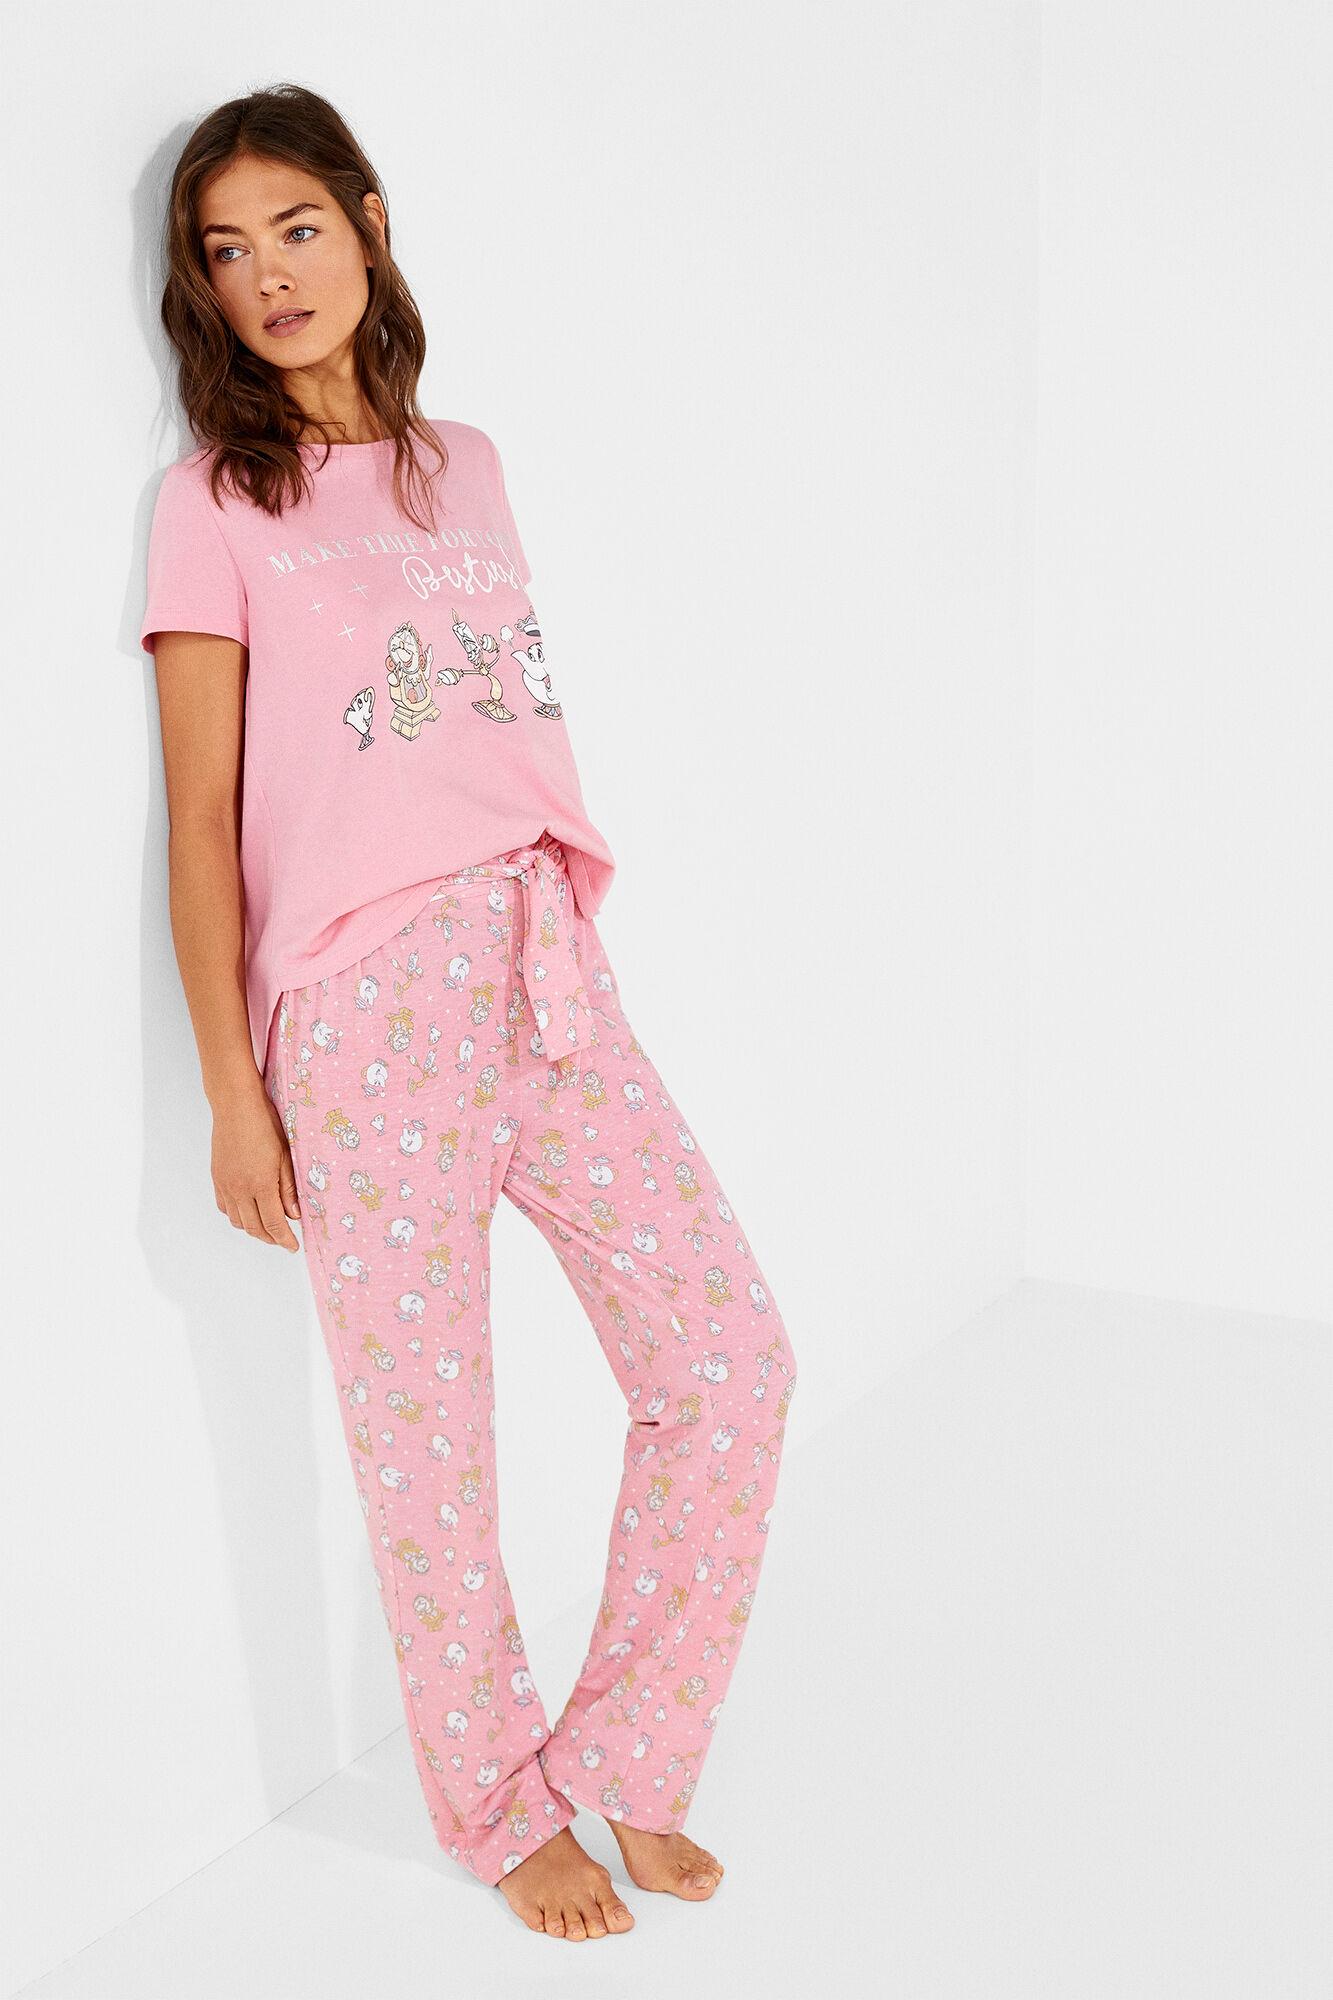 cbbca8a10c Long Beauty and the Beast pyjamas